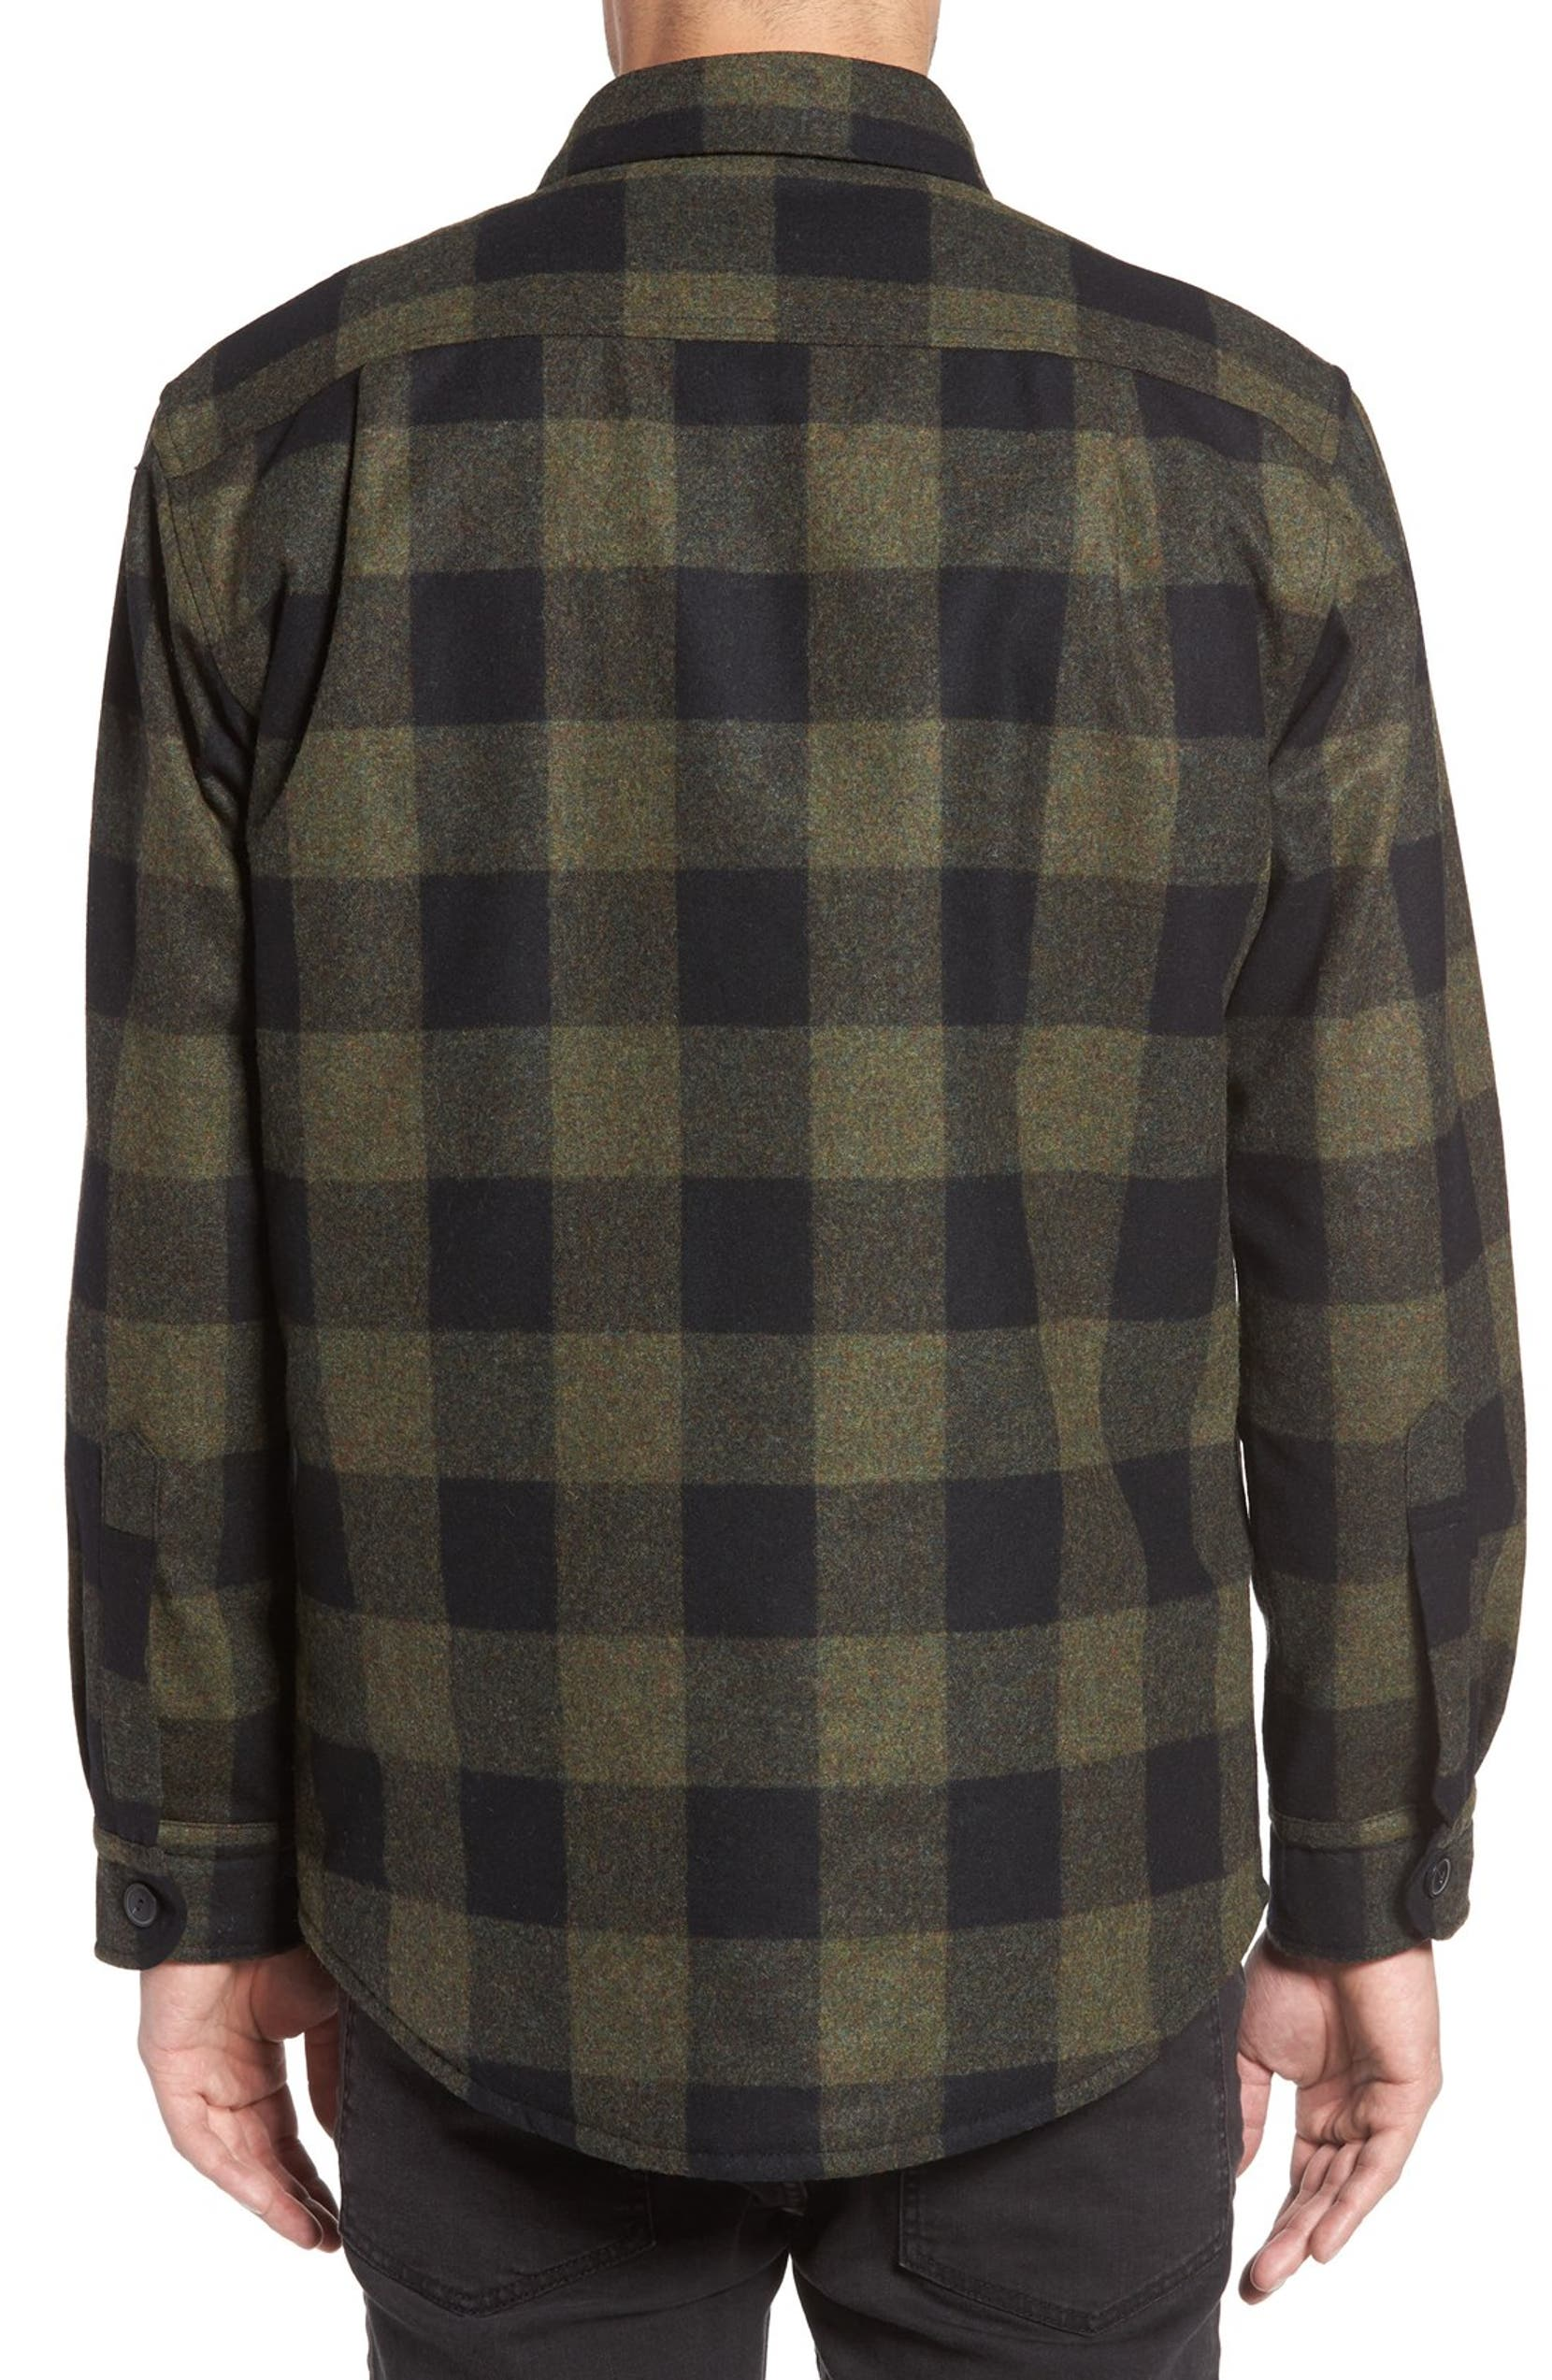 360880fcccadb9 Pendleton Quilt Lined CPO Wool Shirt | Nordstrom